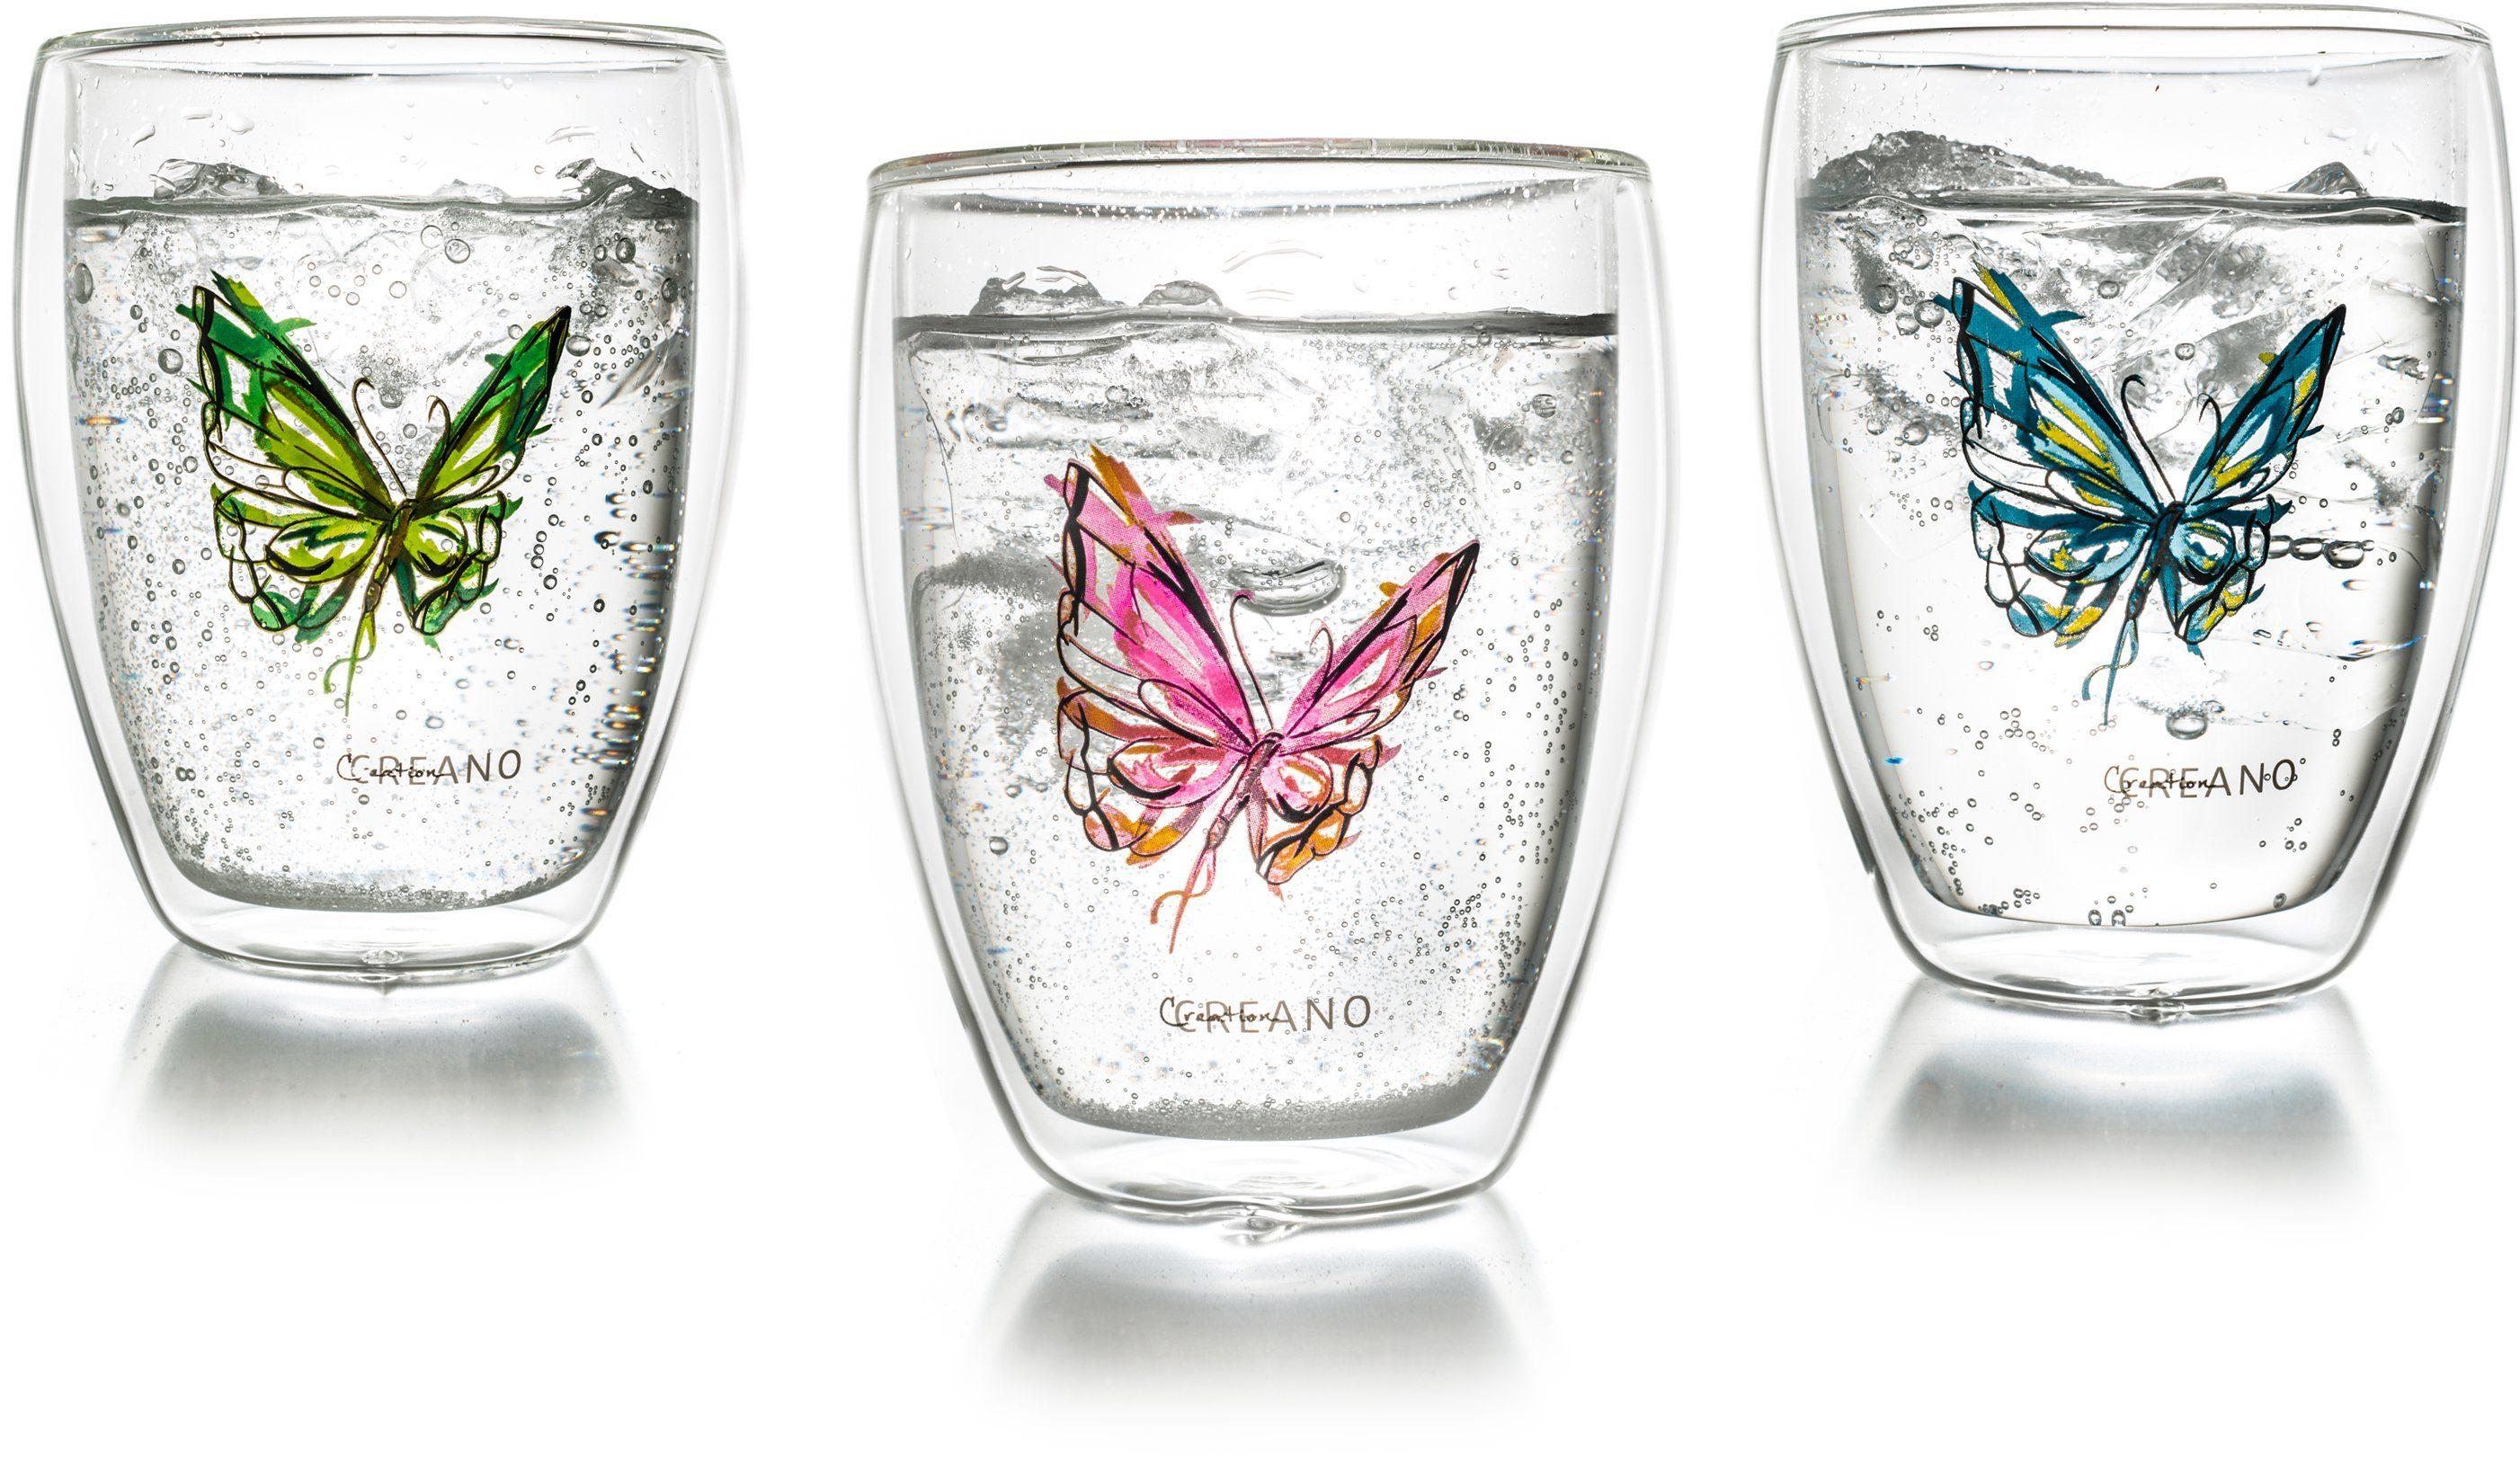 Creano Thermo-Glas, 3-er Set, doppelwandiges Tee-Glas, Latte Macchiato Glas, »Colourfly«